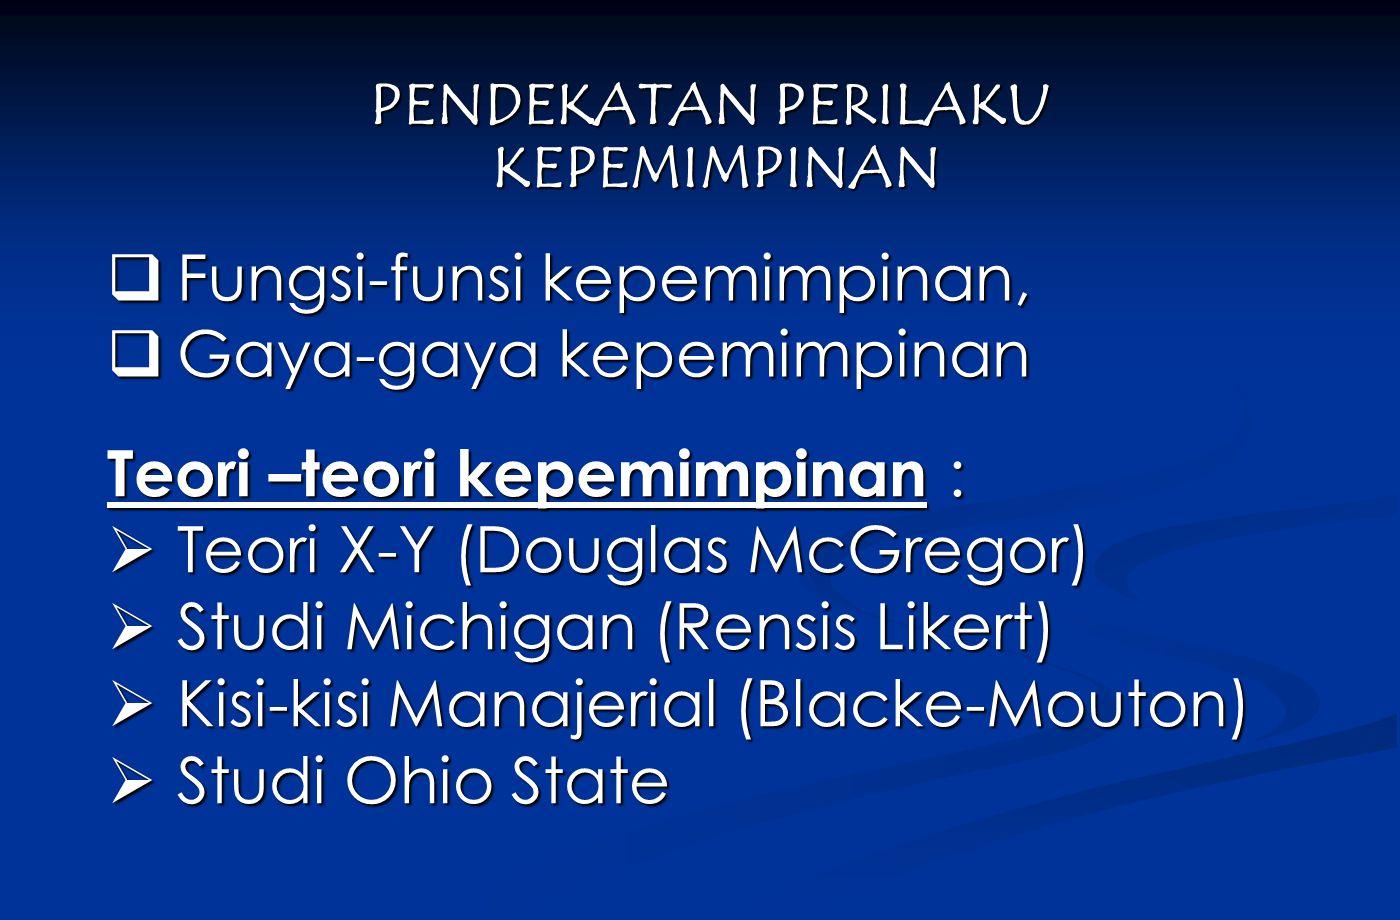  Fungsi-funsi kepemimpinan,  Gaya-gaya kepemimpinan PENDEKATAN PERILAKU KEPEMIMPINAN KEPEMIMPINAN Teori –teori kepemimpinan :  Teori X-Y (Douglas McGregor)  Studi Michigan (Rensis Likert)  Kisi-kisi Manajerial (Blacke-Mouton)  Studi Ohio State